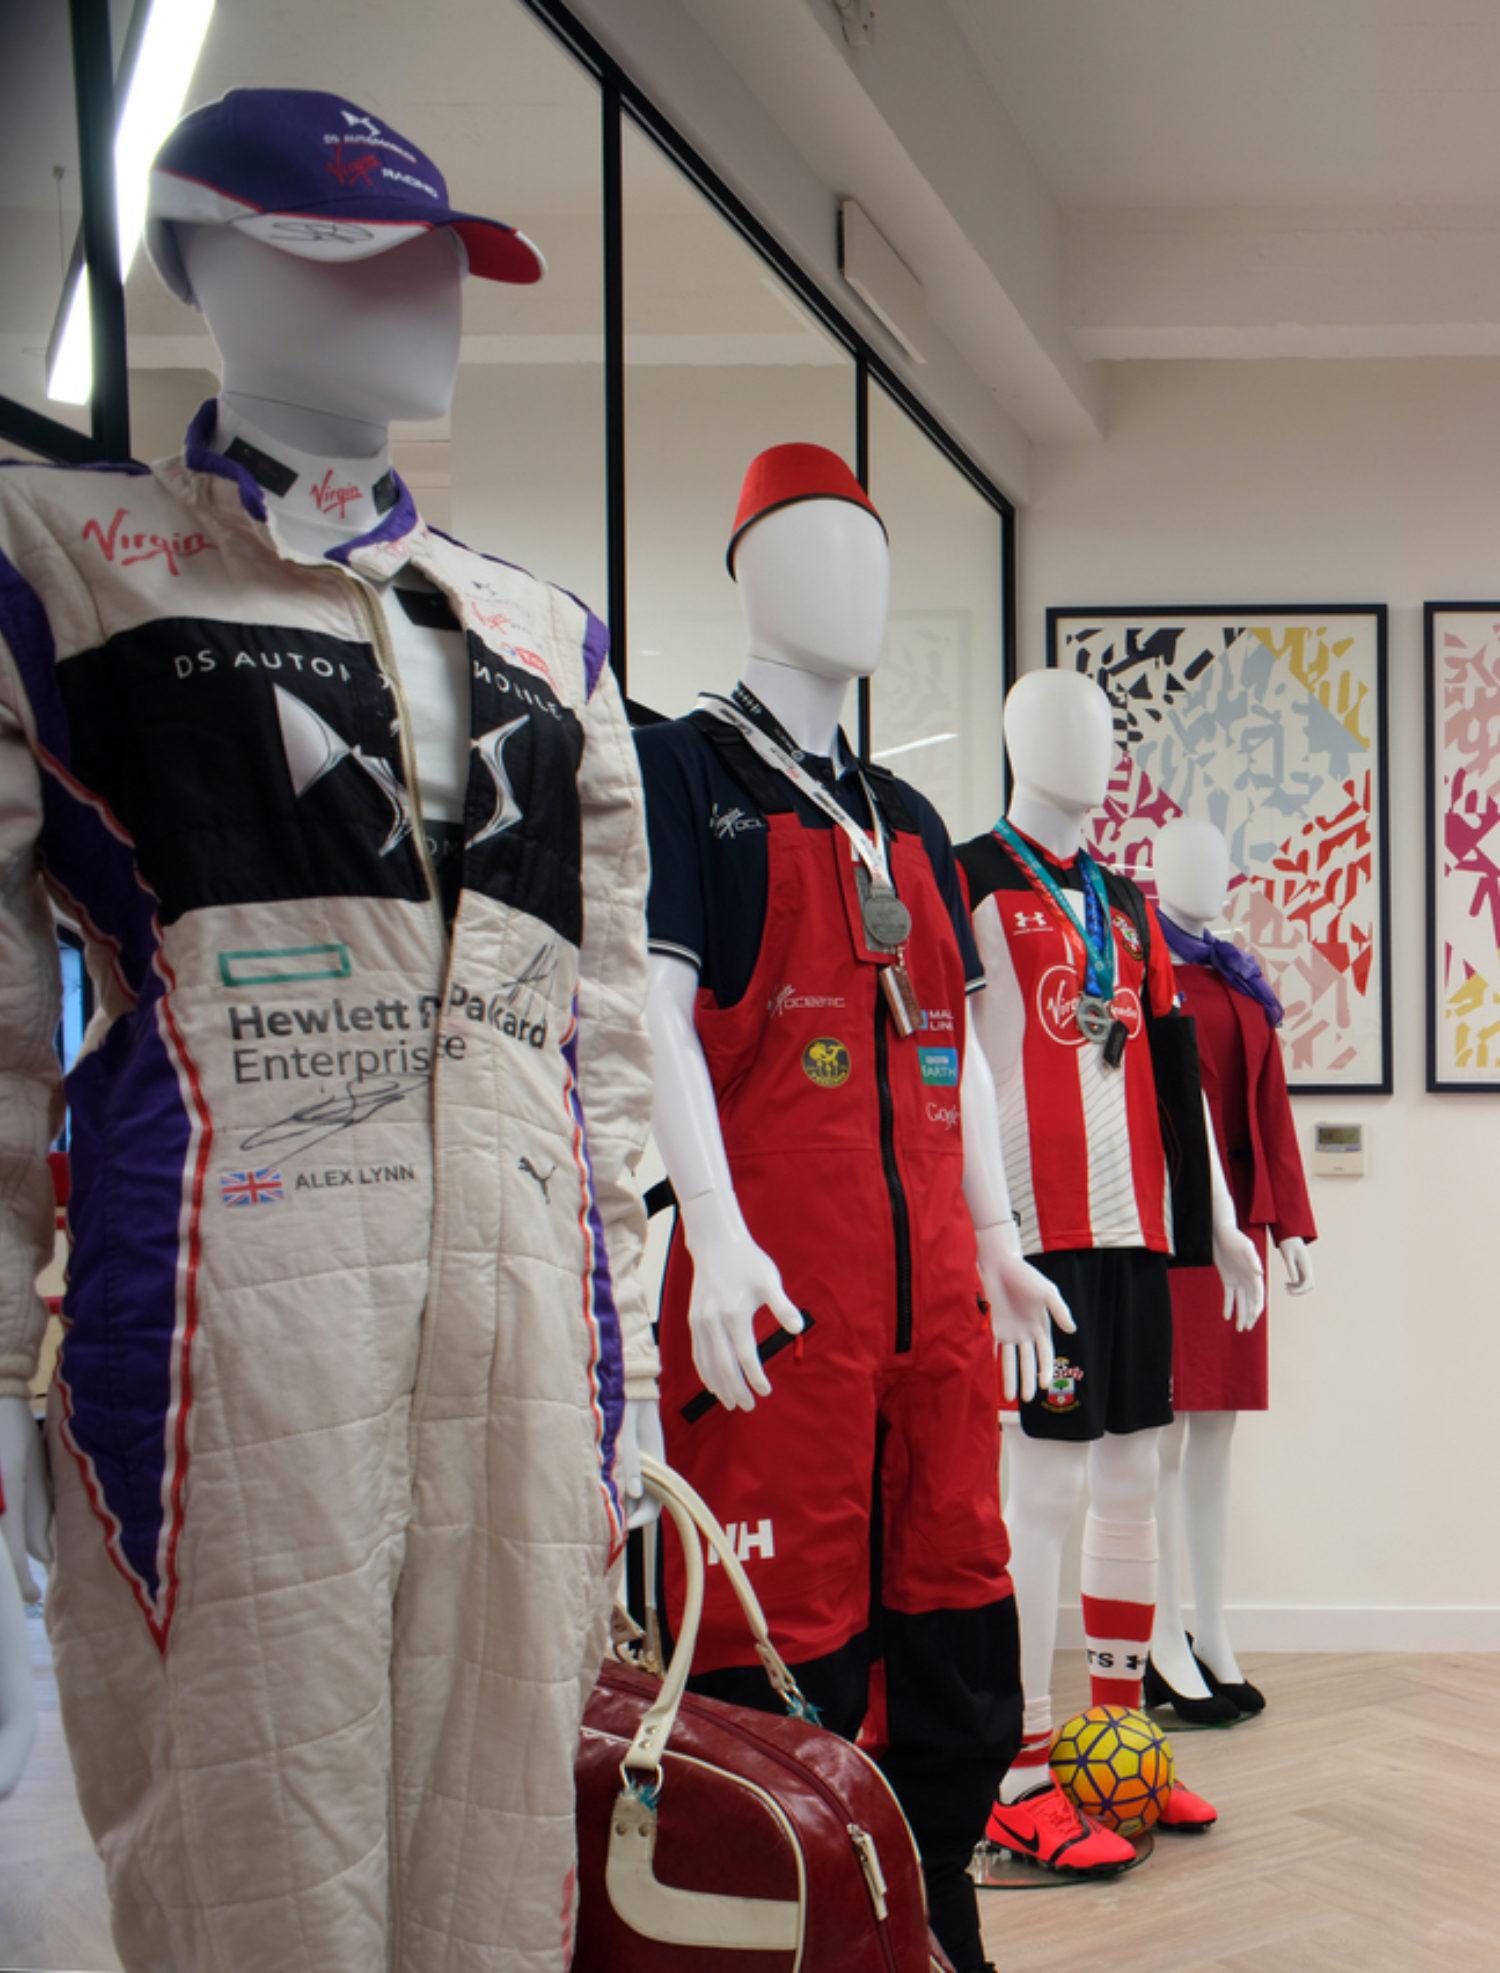 Virgin uniforms in comunal space